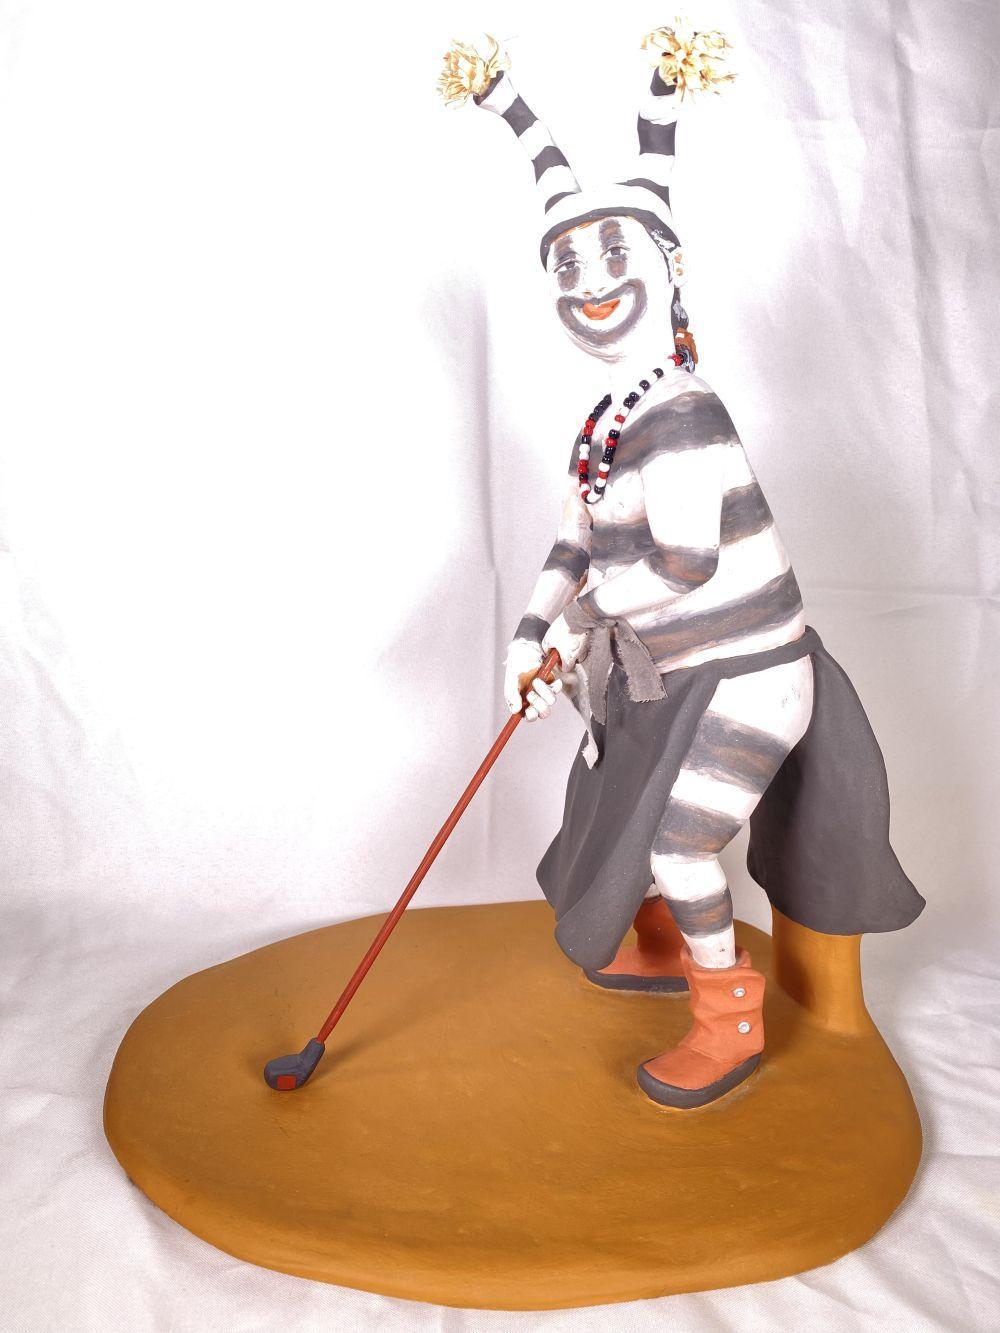 Joe Caajero Jr. KGA Koshaki Native American Watermelon Man Pottery Kachina Golfer